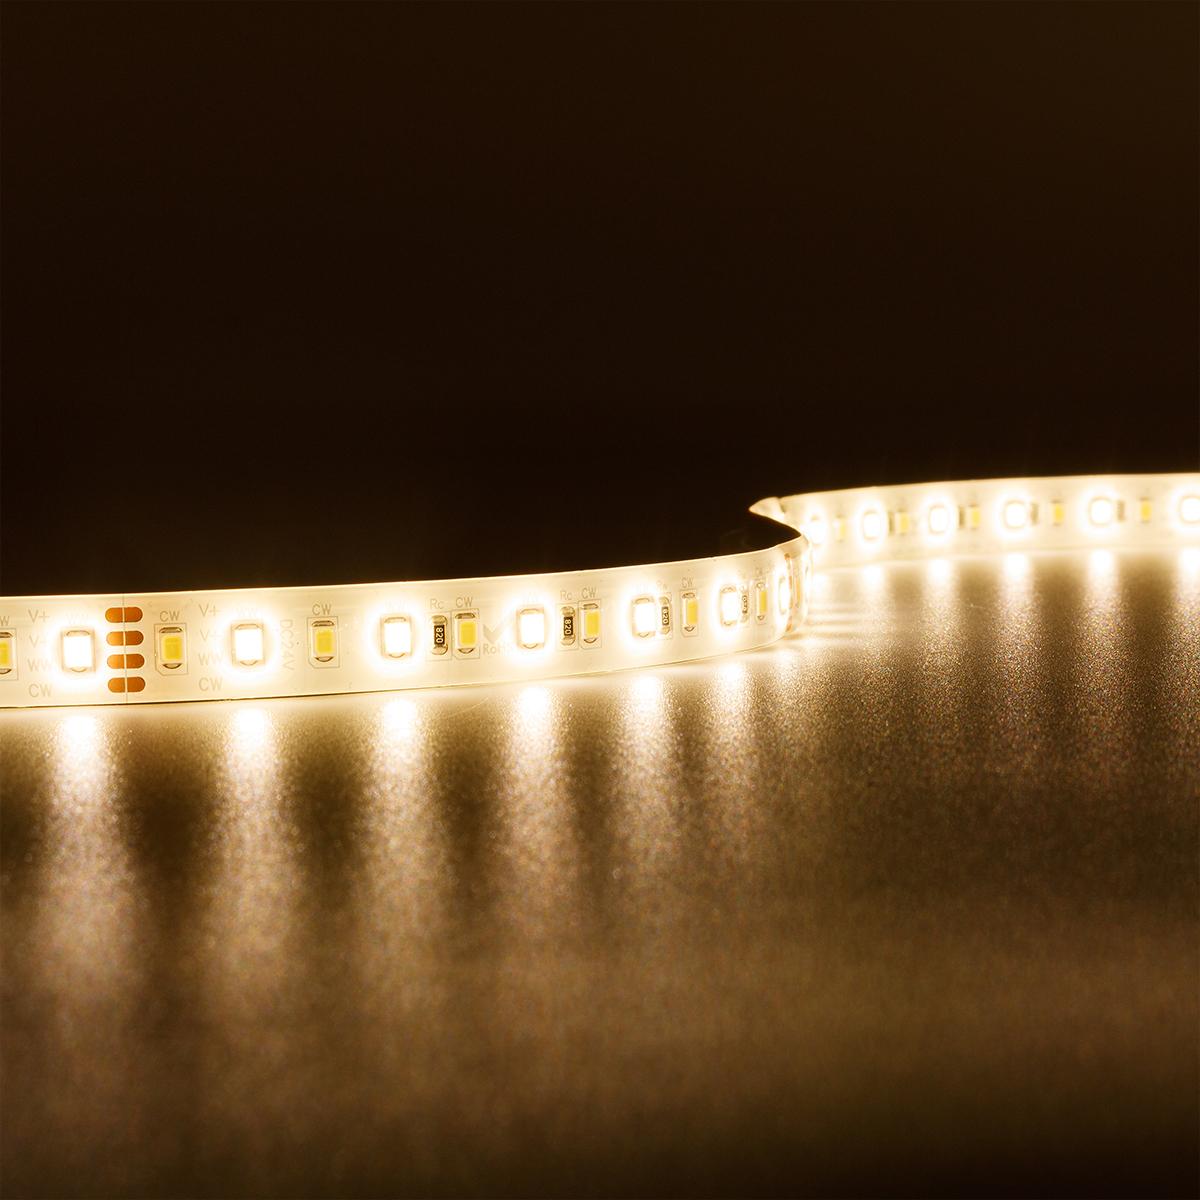 Strip CCT Dual Weiß 24V LED Streifen 5M 18W/m 120LED/m 12mm IP65 Lichtfarbe einstellbar 2700-6000K